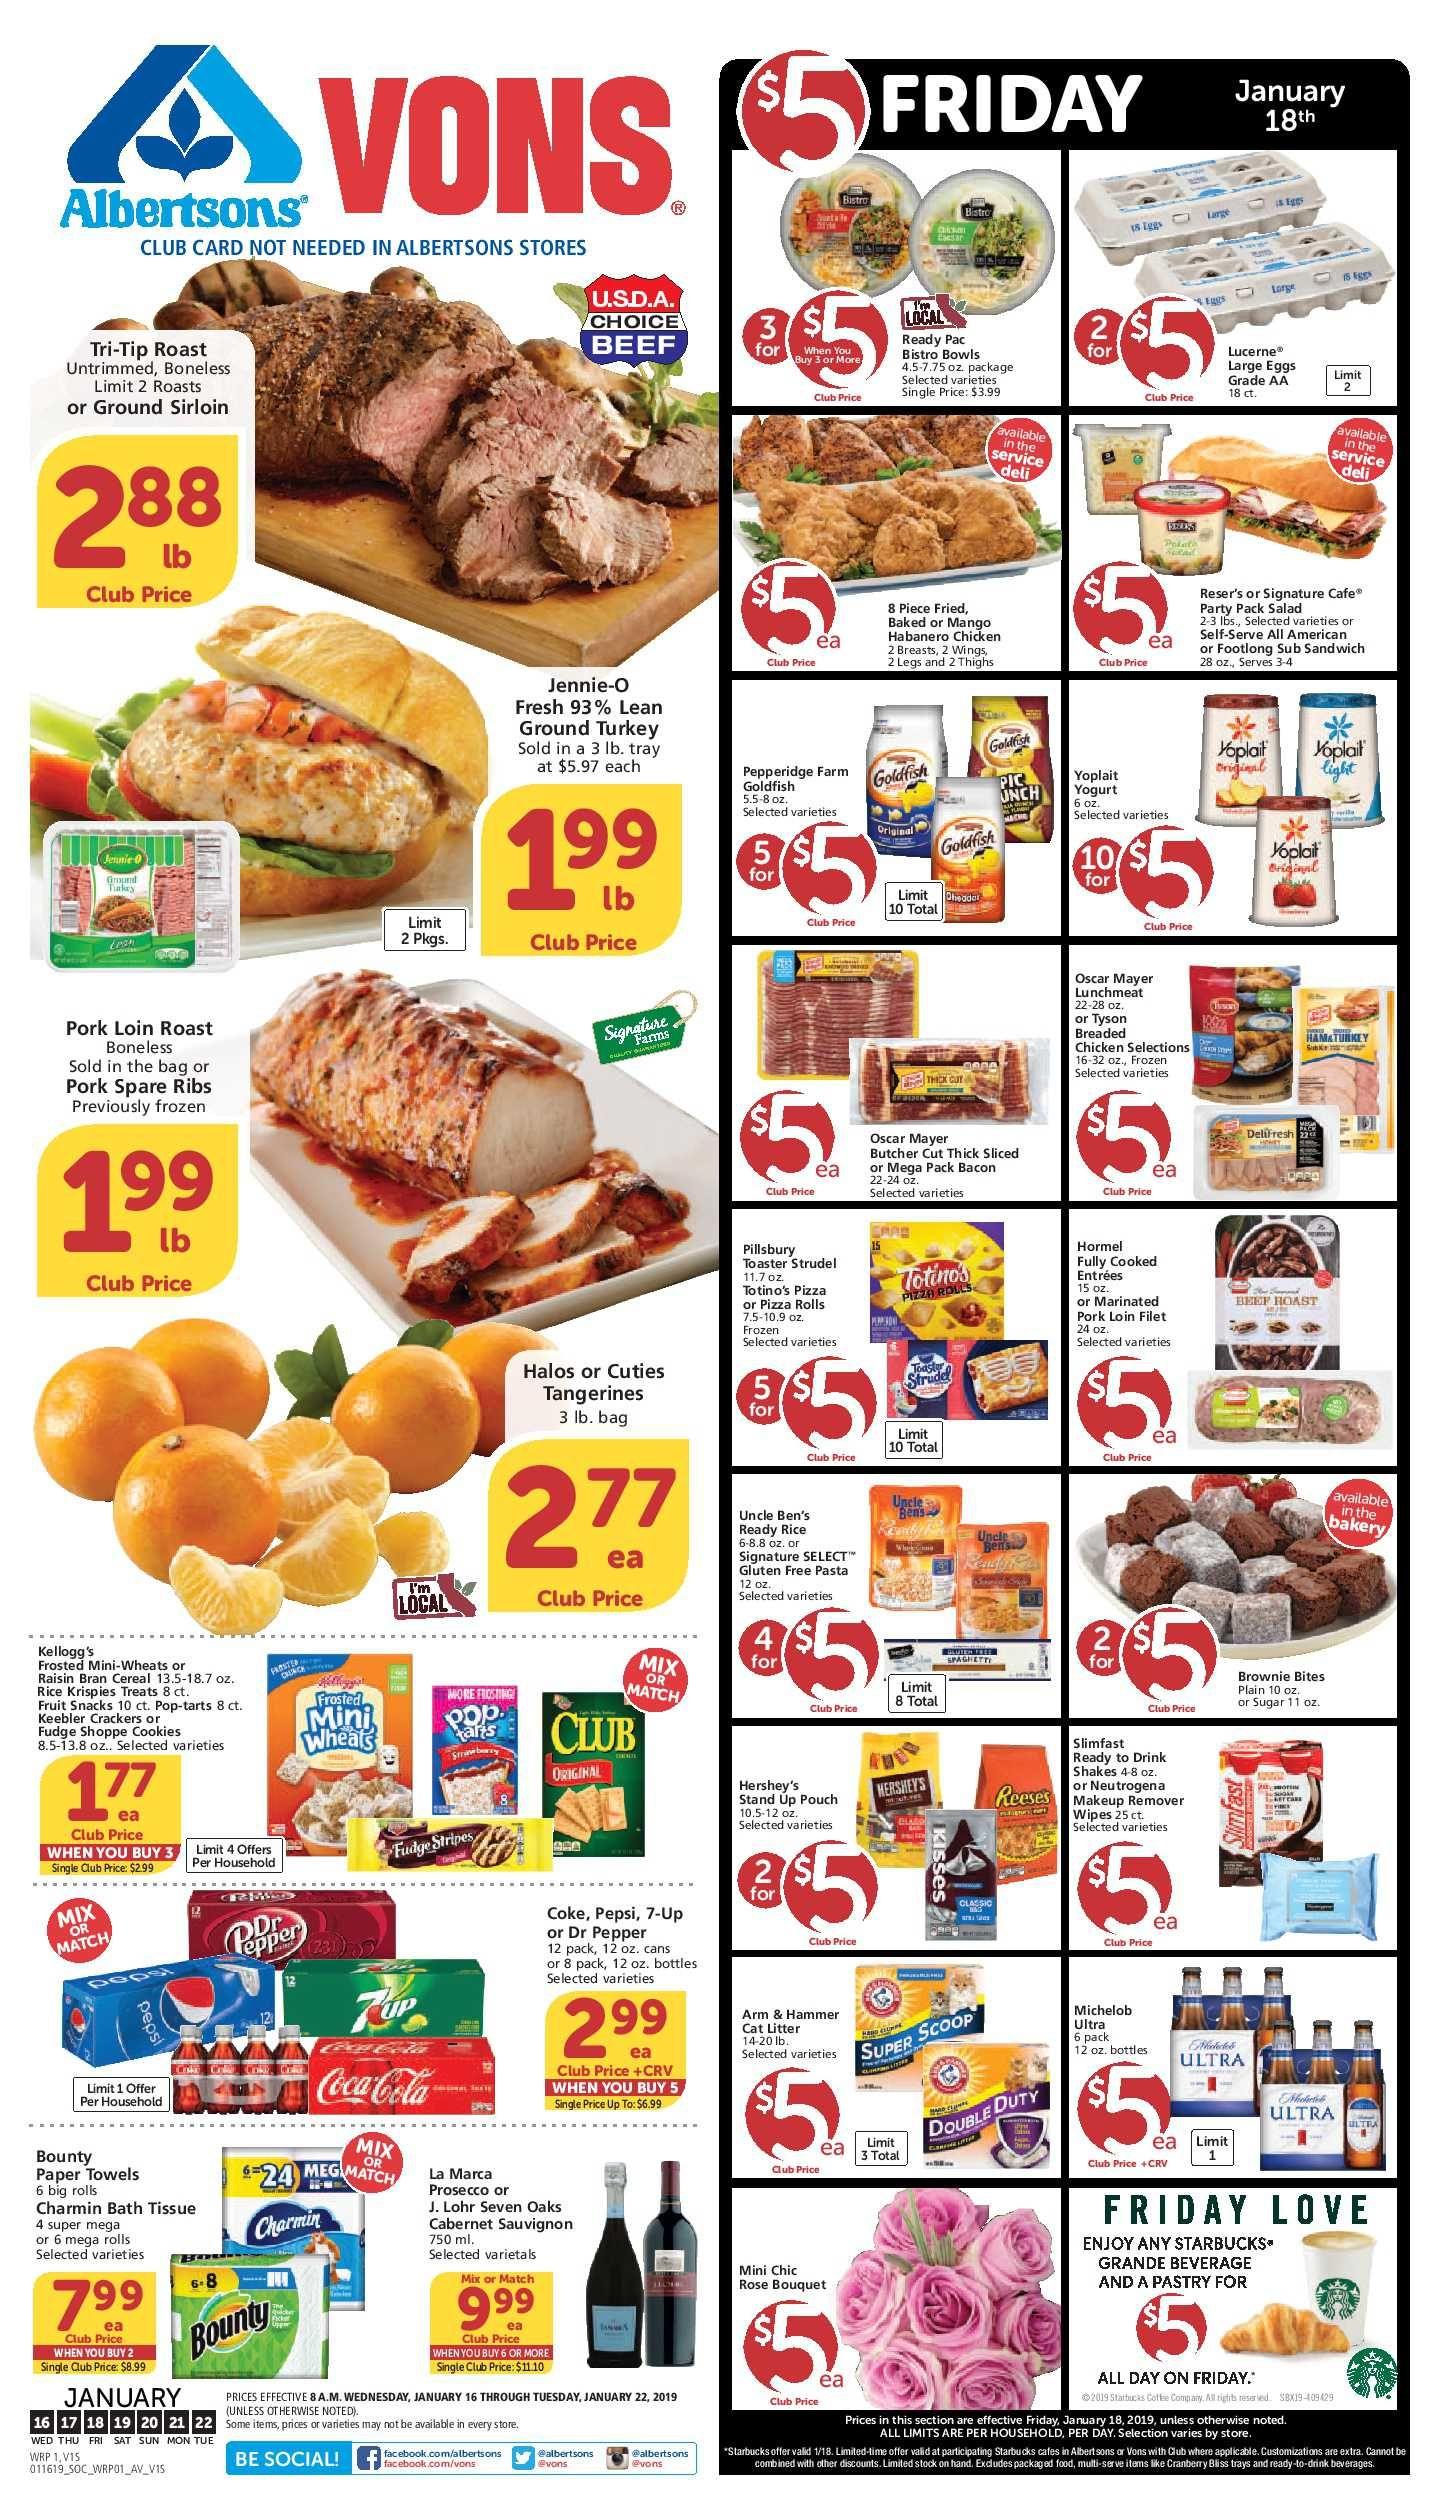 Vons Christmas Dinner 2020 Vons Weekly Ad Flyer 03/11/20 – 03/17/20 | Weeklyad123.